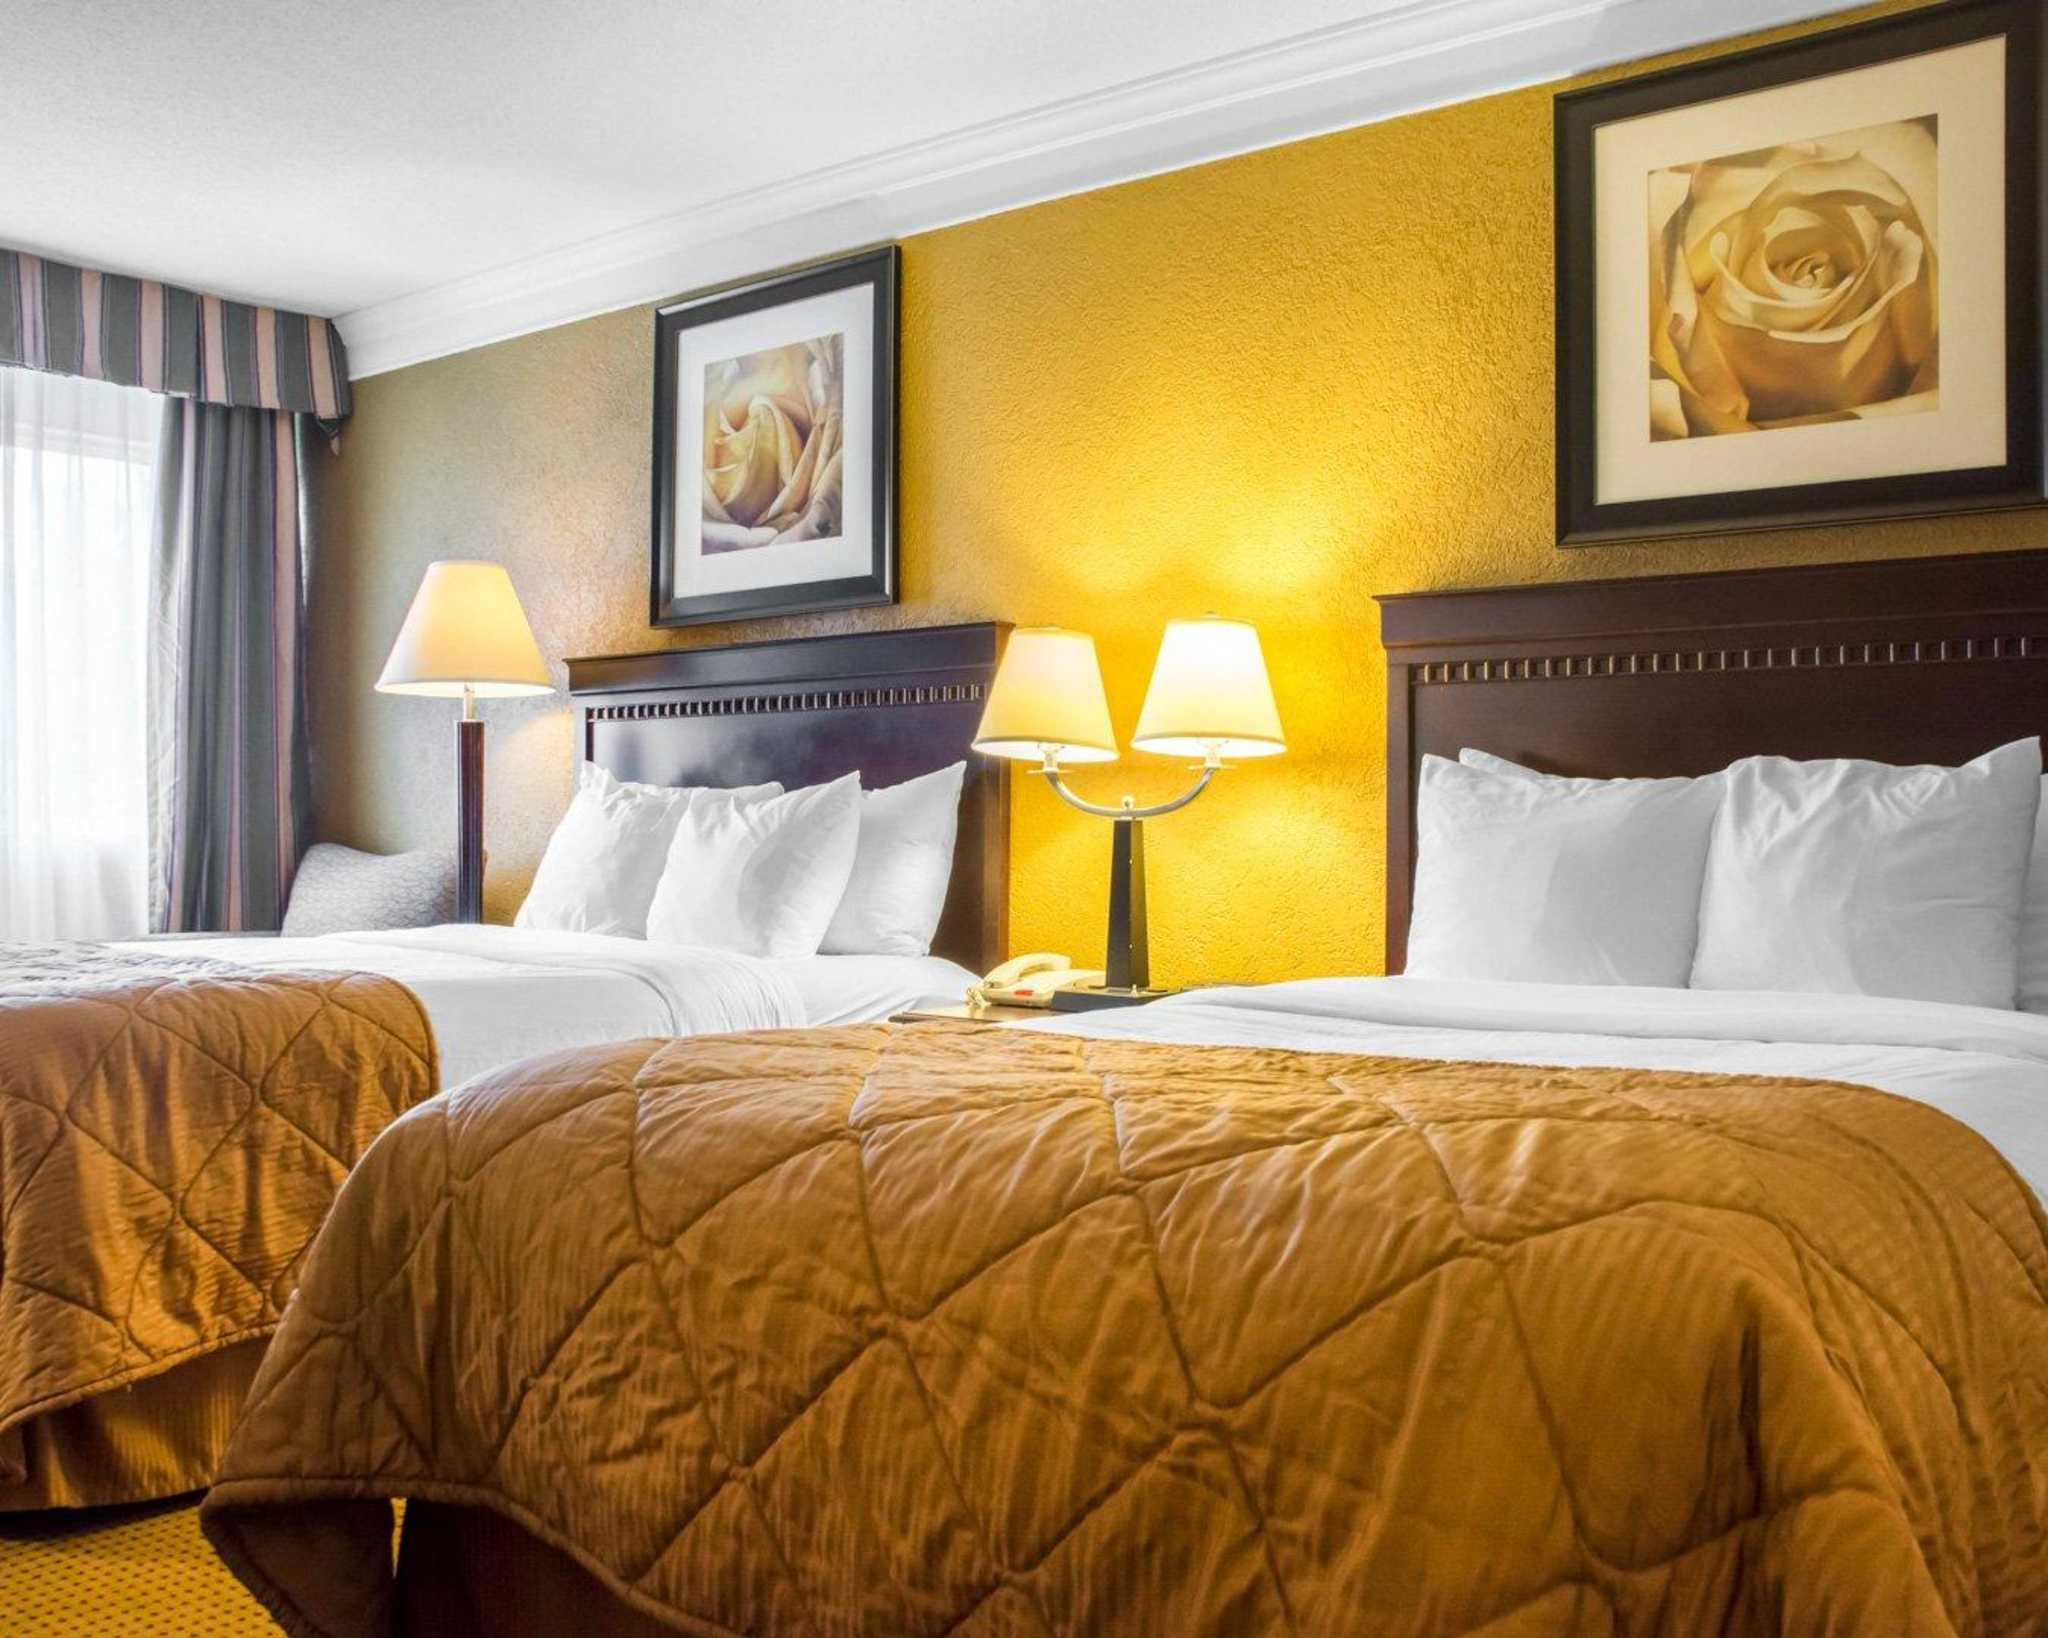 Quality Inn & Suites Fairgrounds image 5